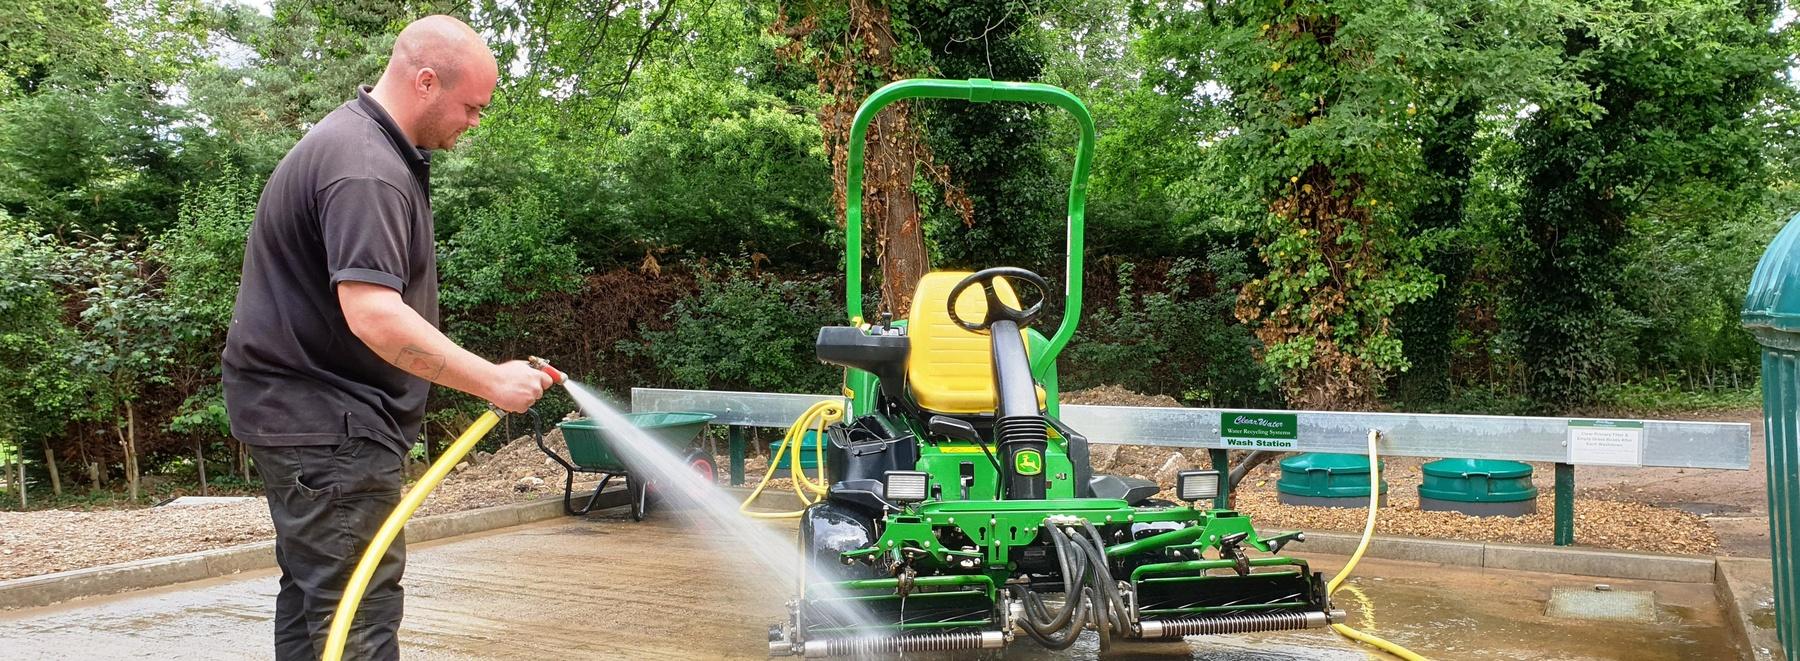 Brookmans Park cropGC's Nick Billington demonstrates the new self-installed …